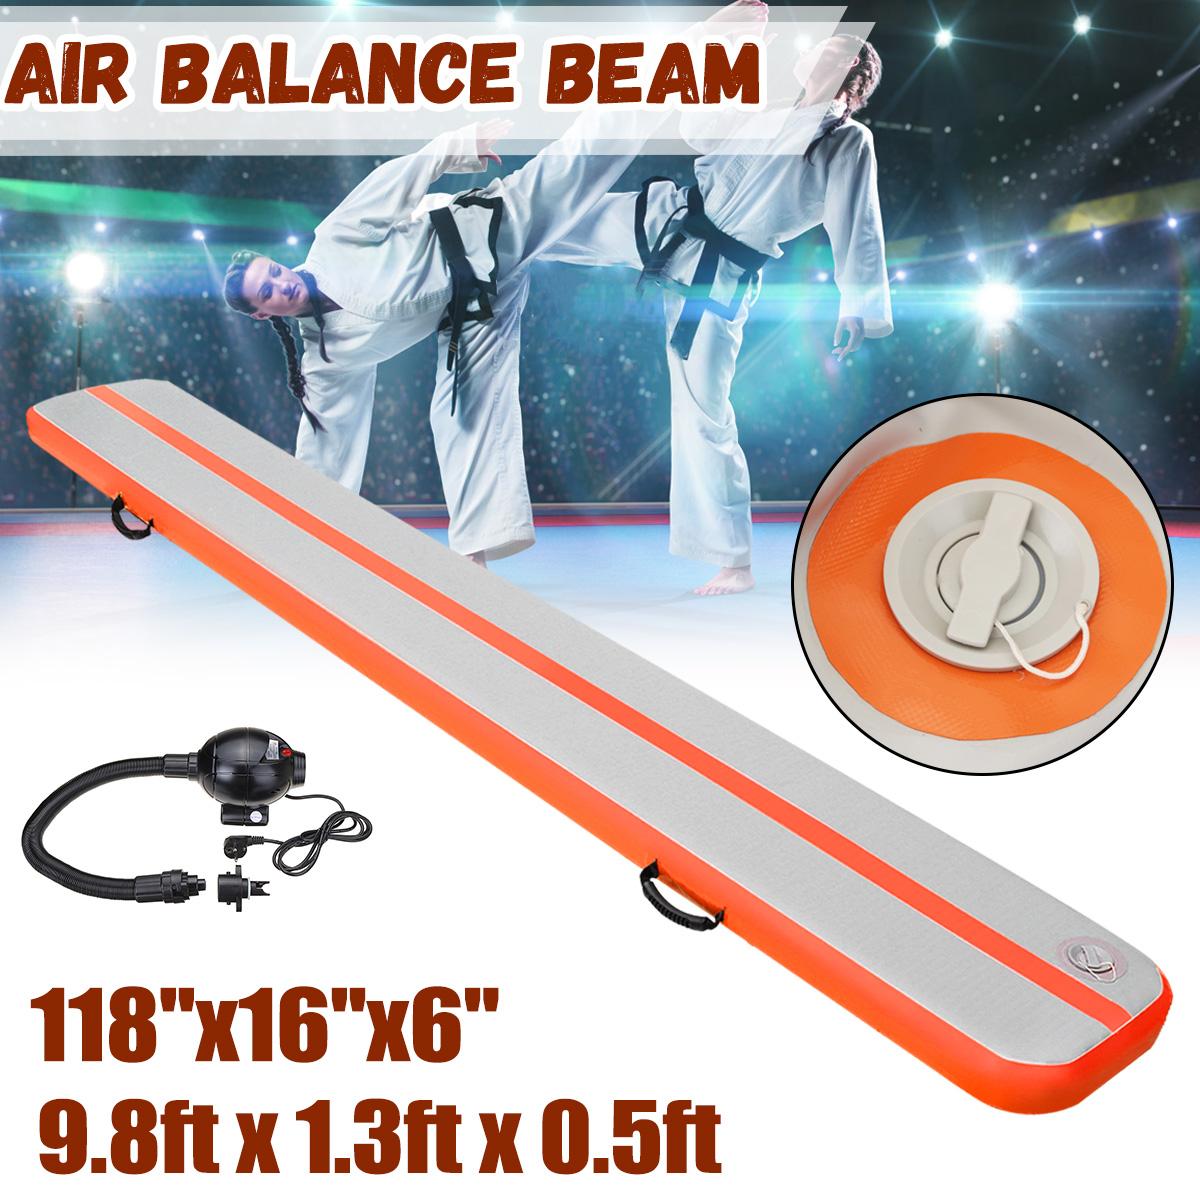 9.8ftx1.3ftx0.5ft Gymnastics GYM inflatable air track Air Balance Beam Inflatable Practice Floor Training Yoga Mat Air Tumbling Track + 110V Pump, US Plug, Orange & Grey